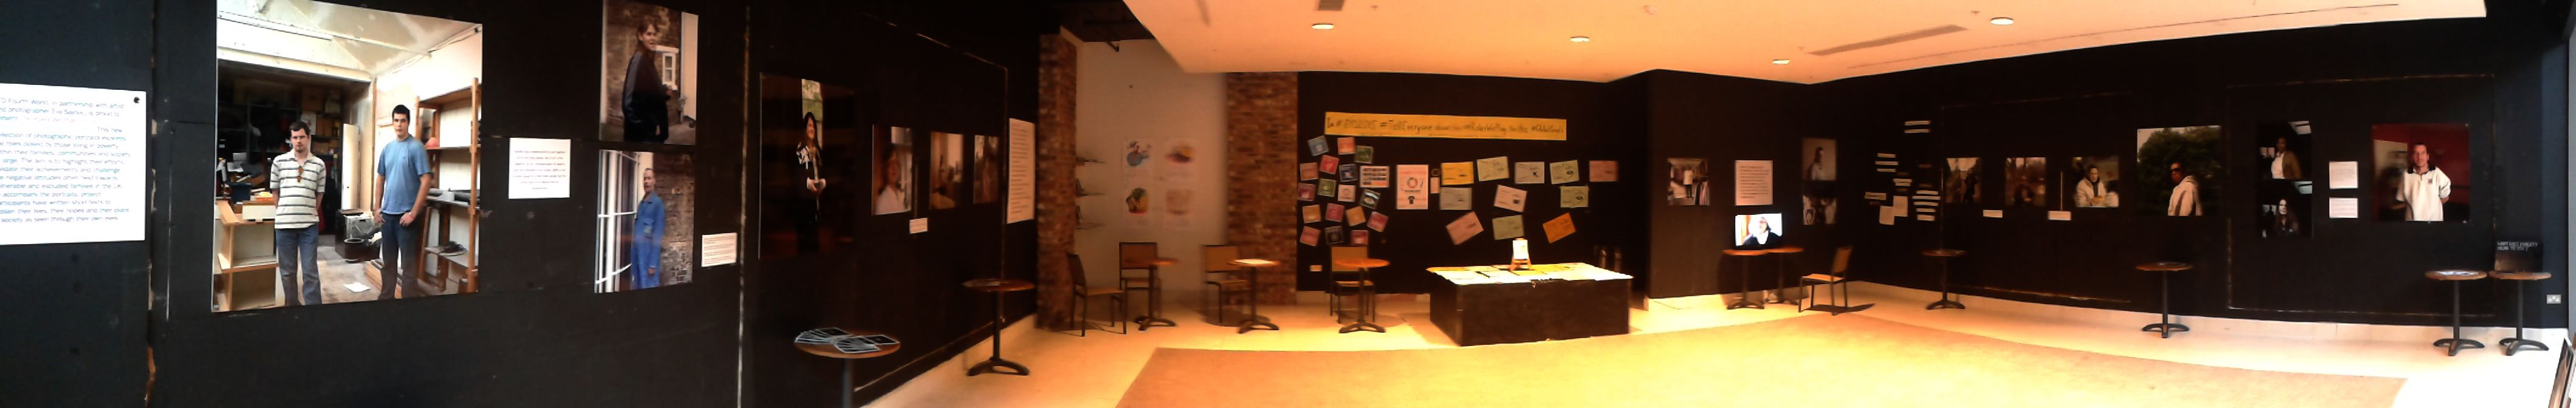 RWP Dublin Exhibition